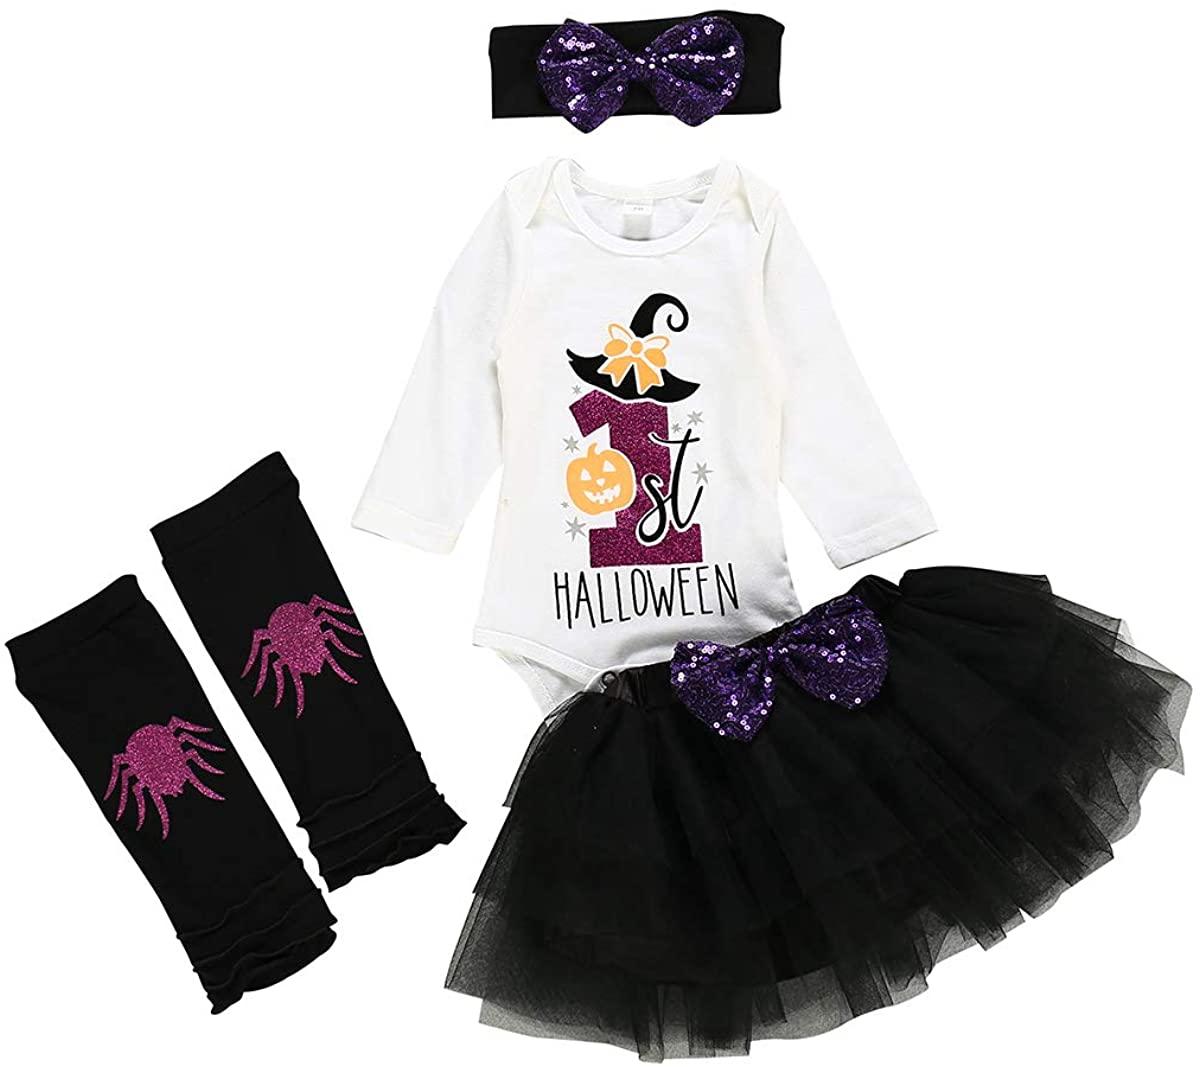 Toddler Baby Girls Outfit My First Halloween Top Romper+ Tutu Skirt+ Leg Warmer +Headband 4Pcs Outfit Set